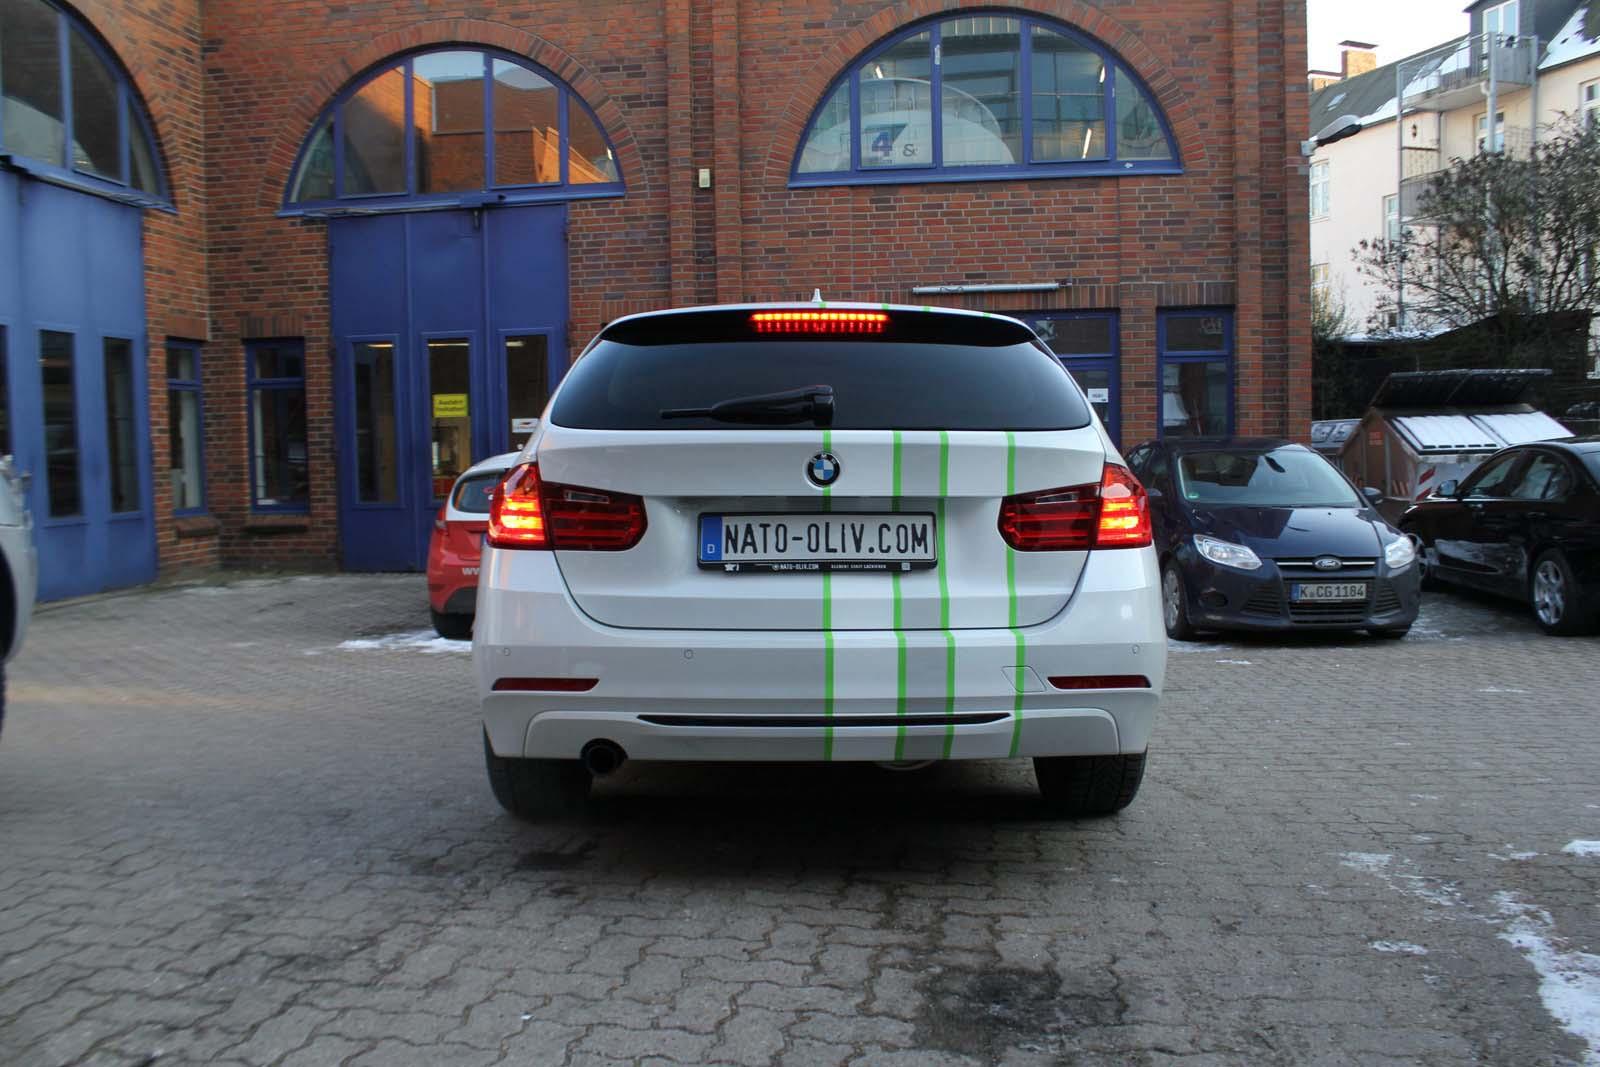 BMW_3ER_RALLYESTREIFEN_WEISS_GRUEN_MATT_MIT_BRANDING_21